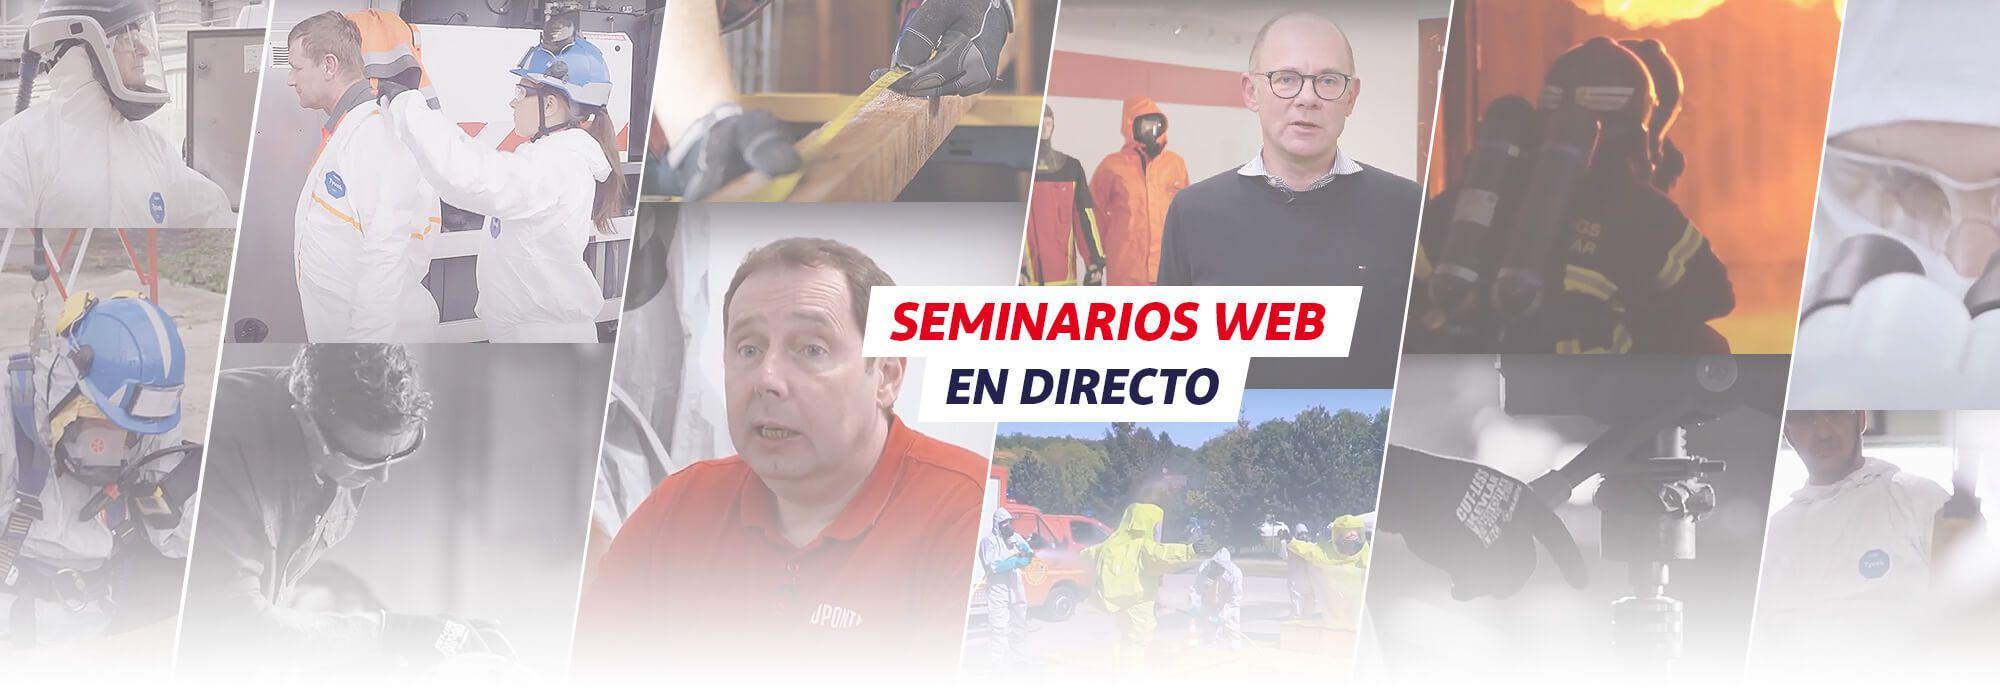 dupont-webinar-academy